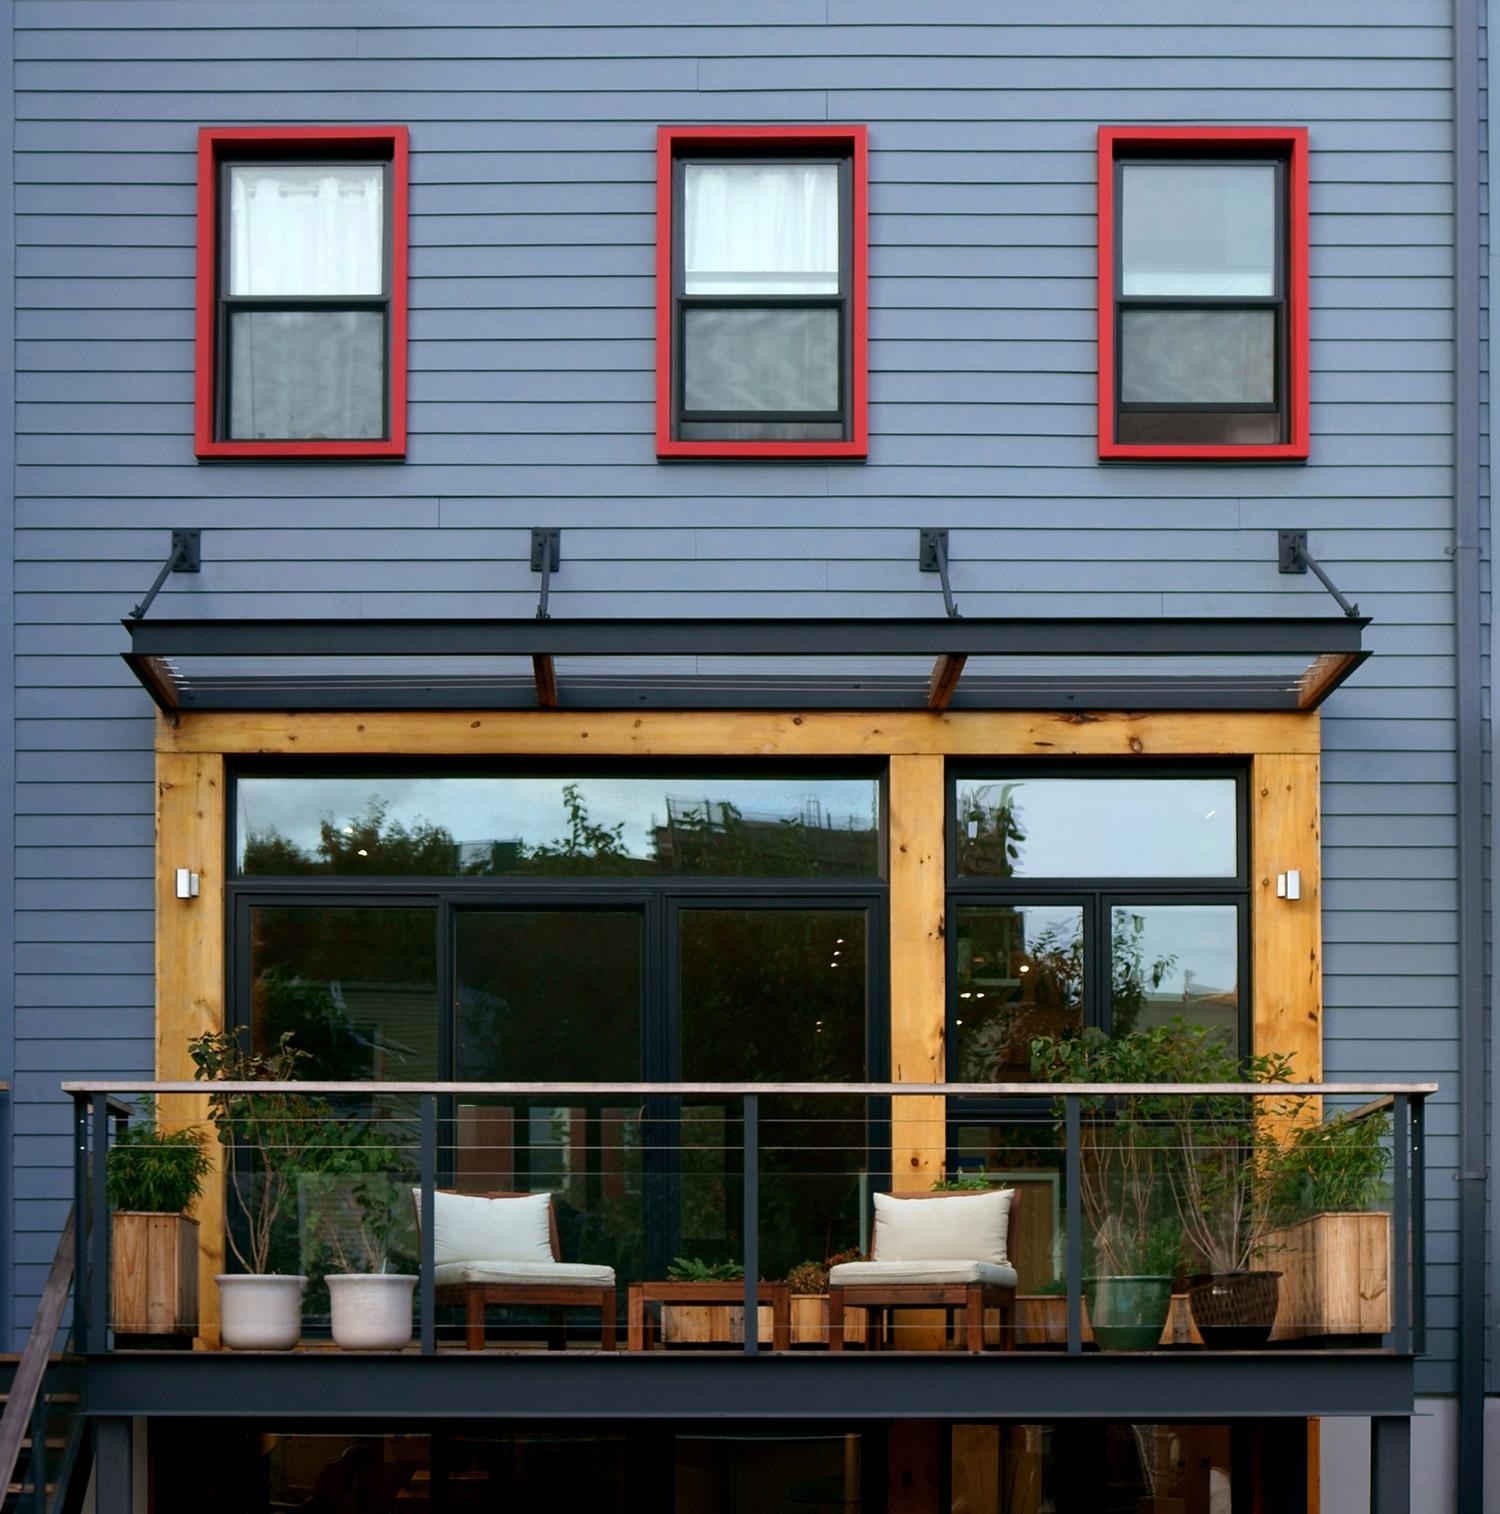 brooklyn-architect-townhouse-renovation7-exterior2.jpg